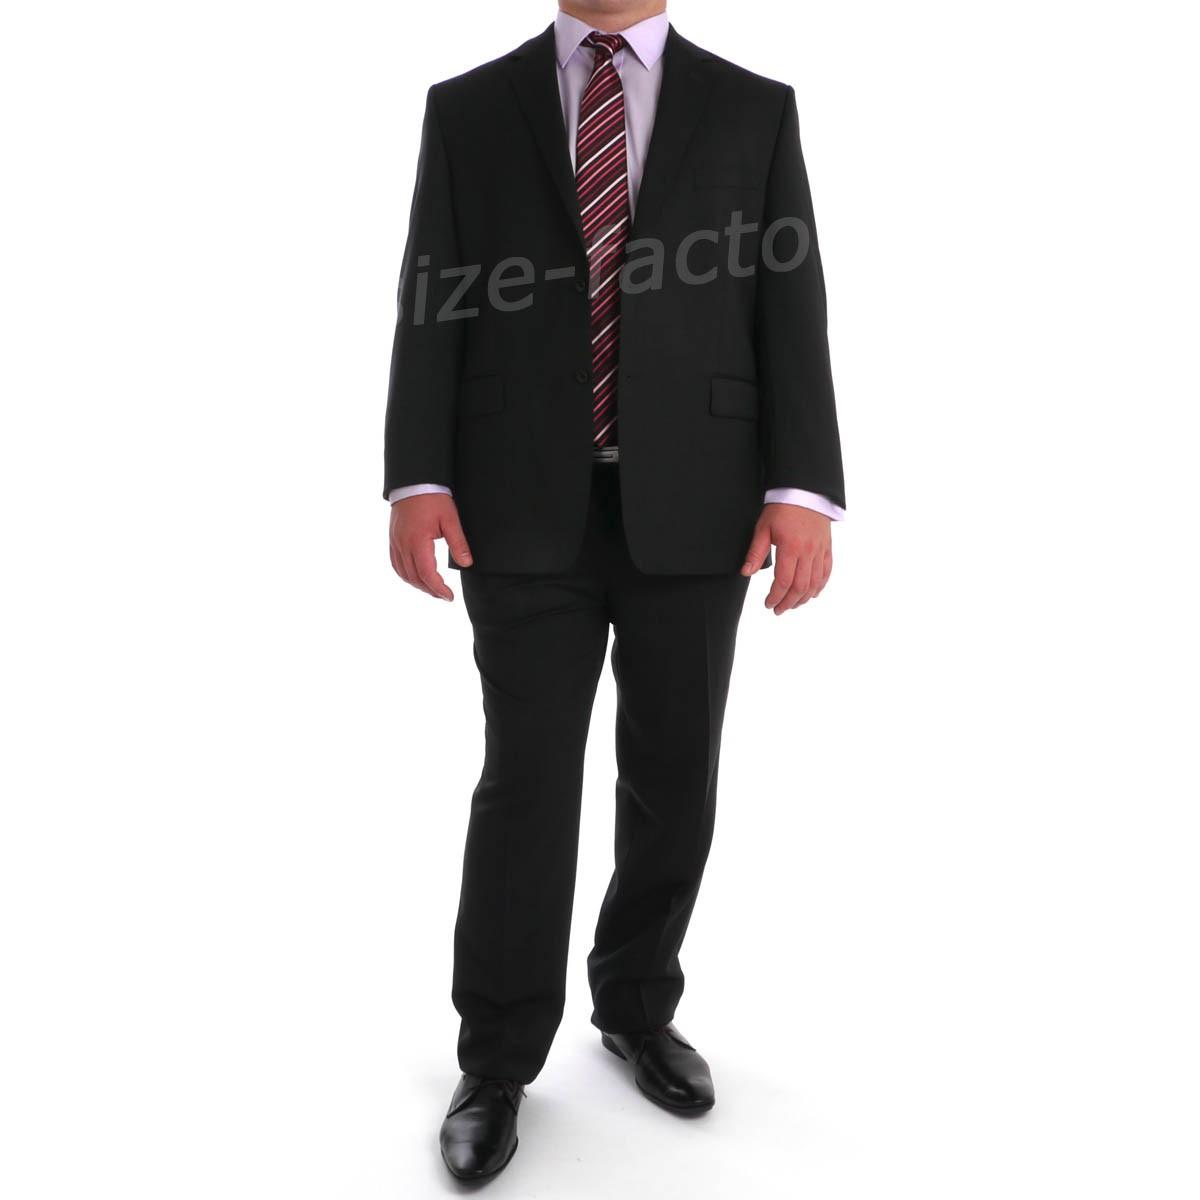 pantalon de costume grande taille jusqu 39 au 70 maneven maneven. Black Bedroom Furniture Sets. Home Design Ideas